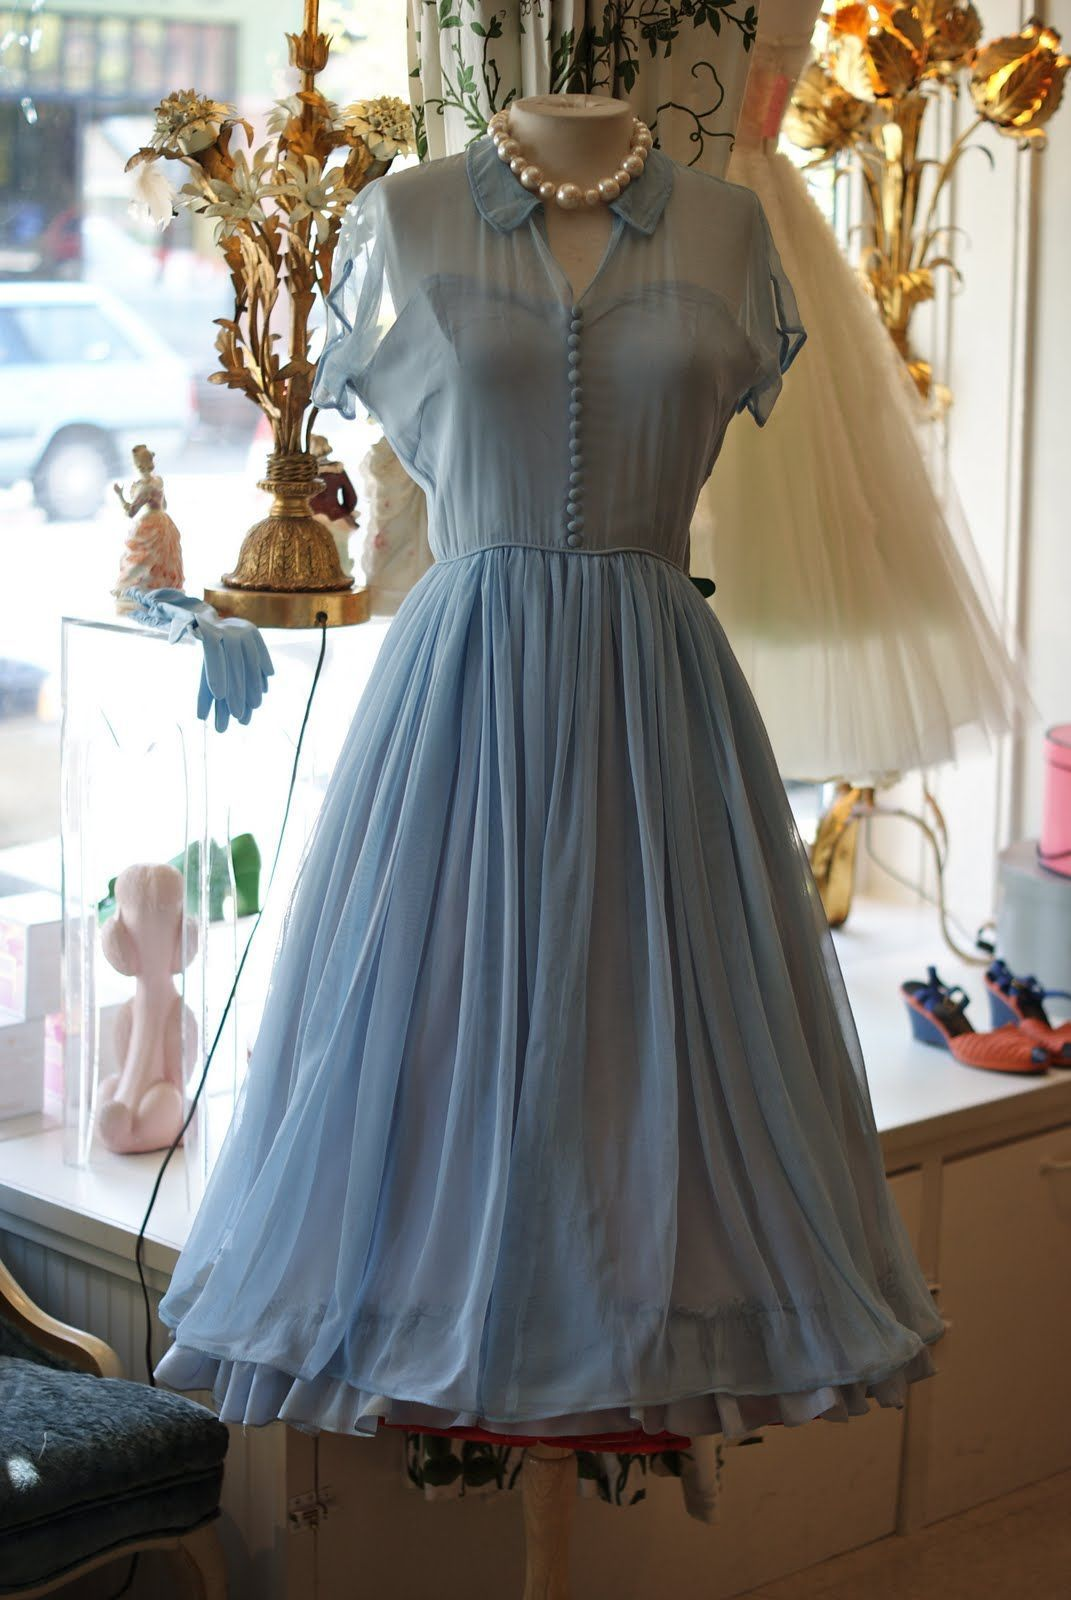 1950 S Emma Domb Powder Blue Prom Dress Vintage Dresses Dress Clothe Women S Fashion Outfit Inspirati Vintage Style Dresses Vintage Dresses Vintage Outfits [ 1600 x 1071 Pixel ]